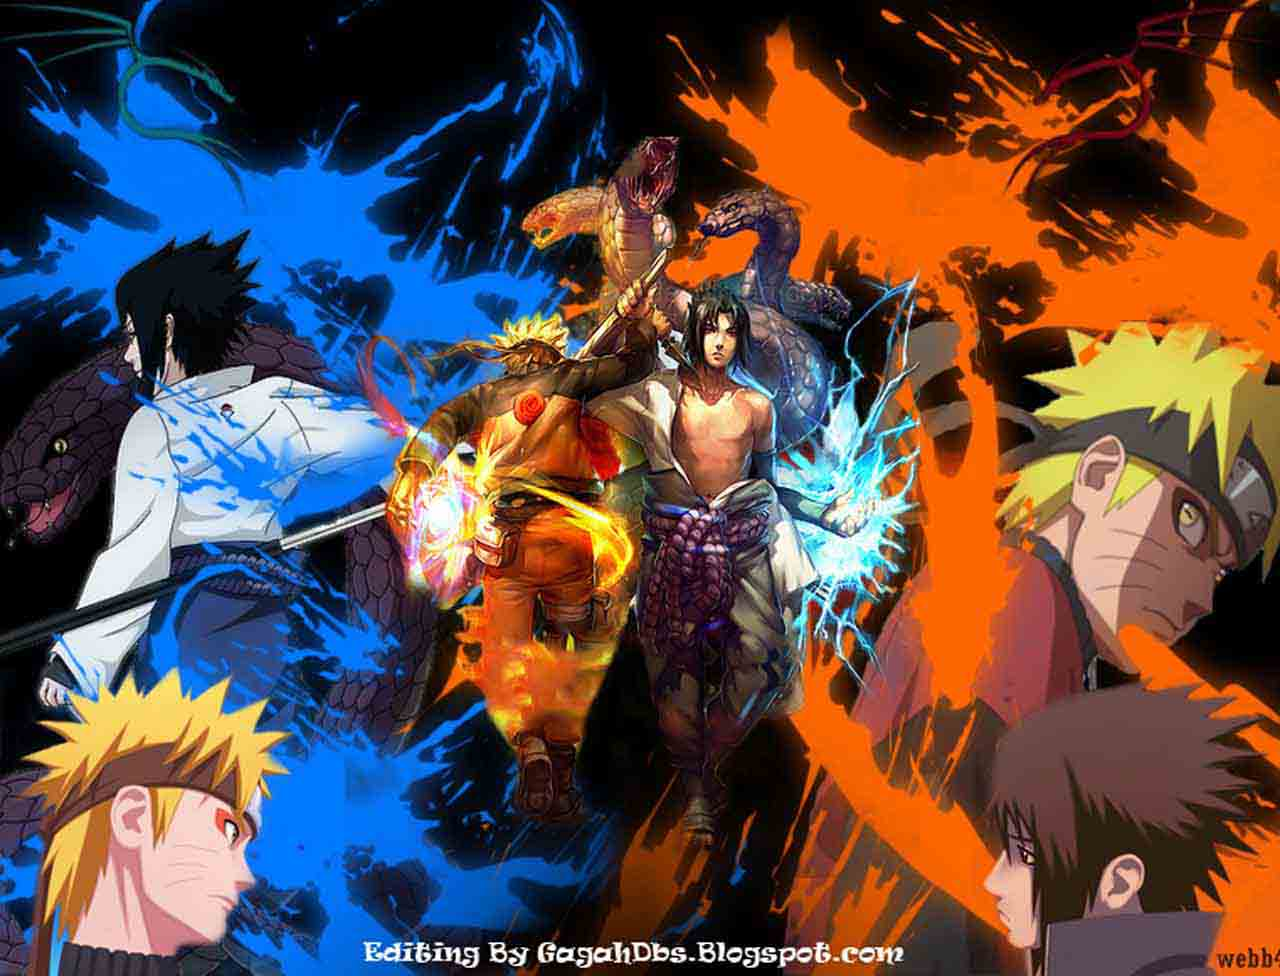 Gambar Naruto Shippuden Wallpaper Bergerak